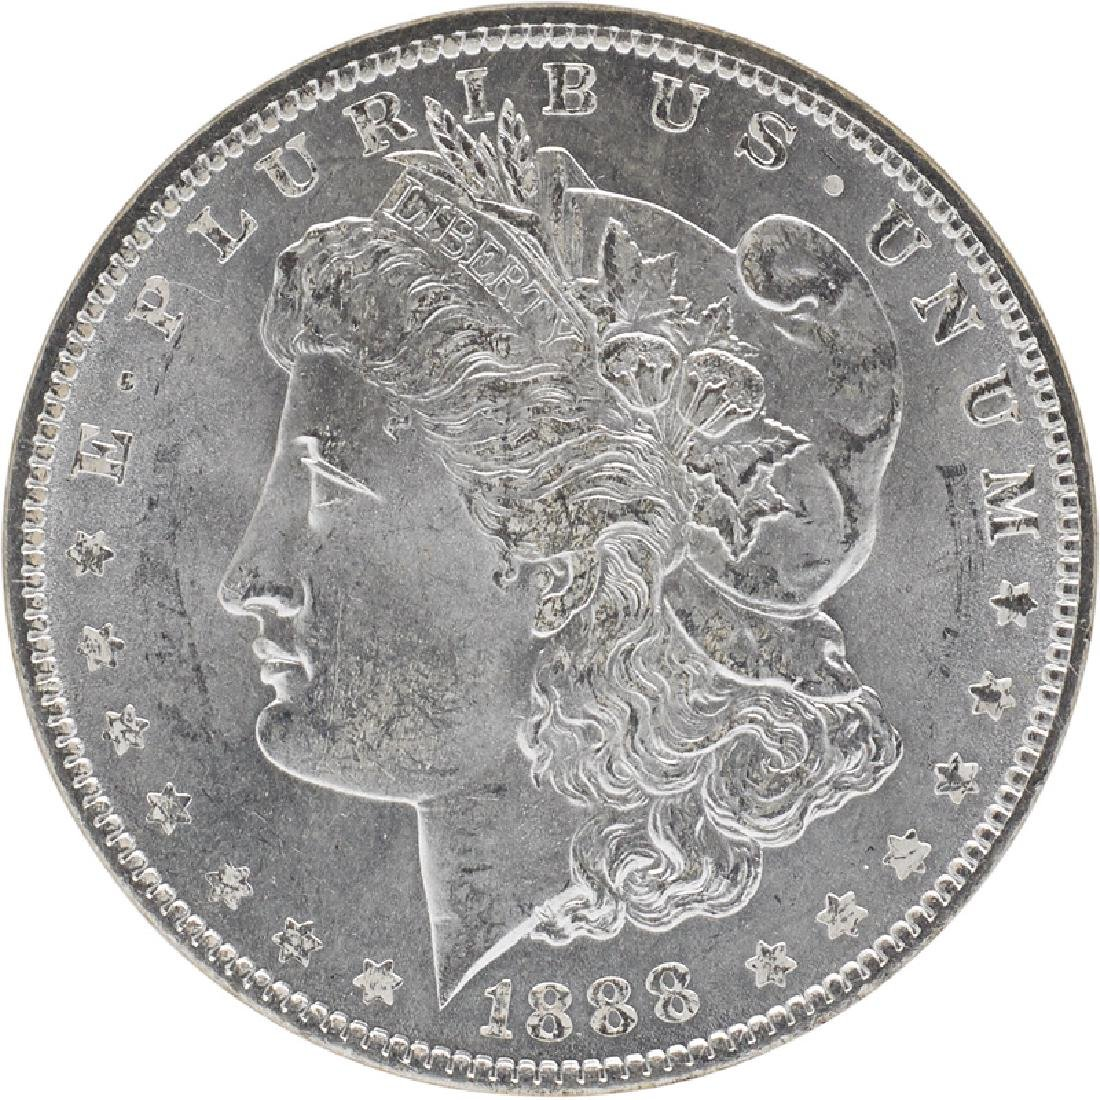 U.S. 1888 MORGAN $1 COIN